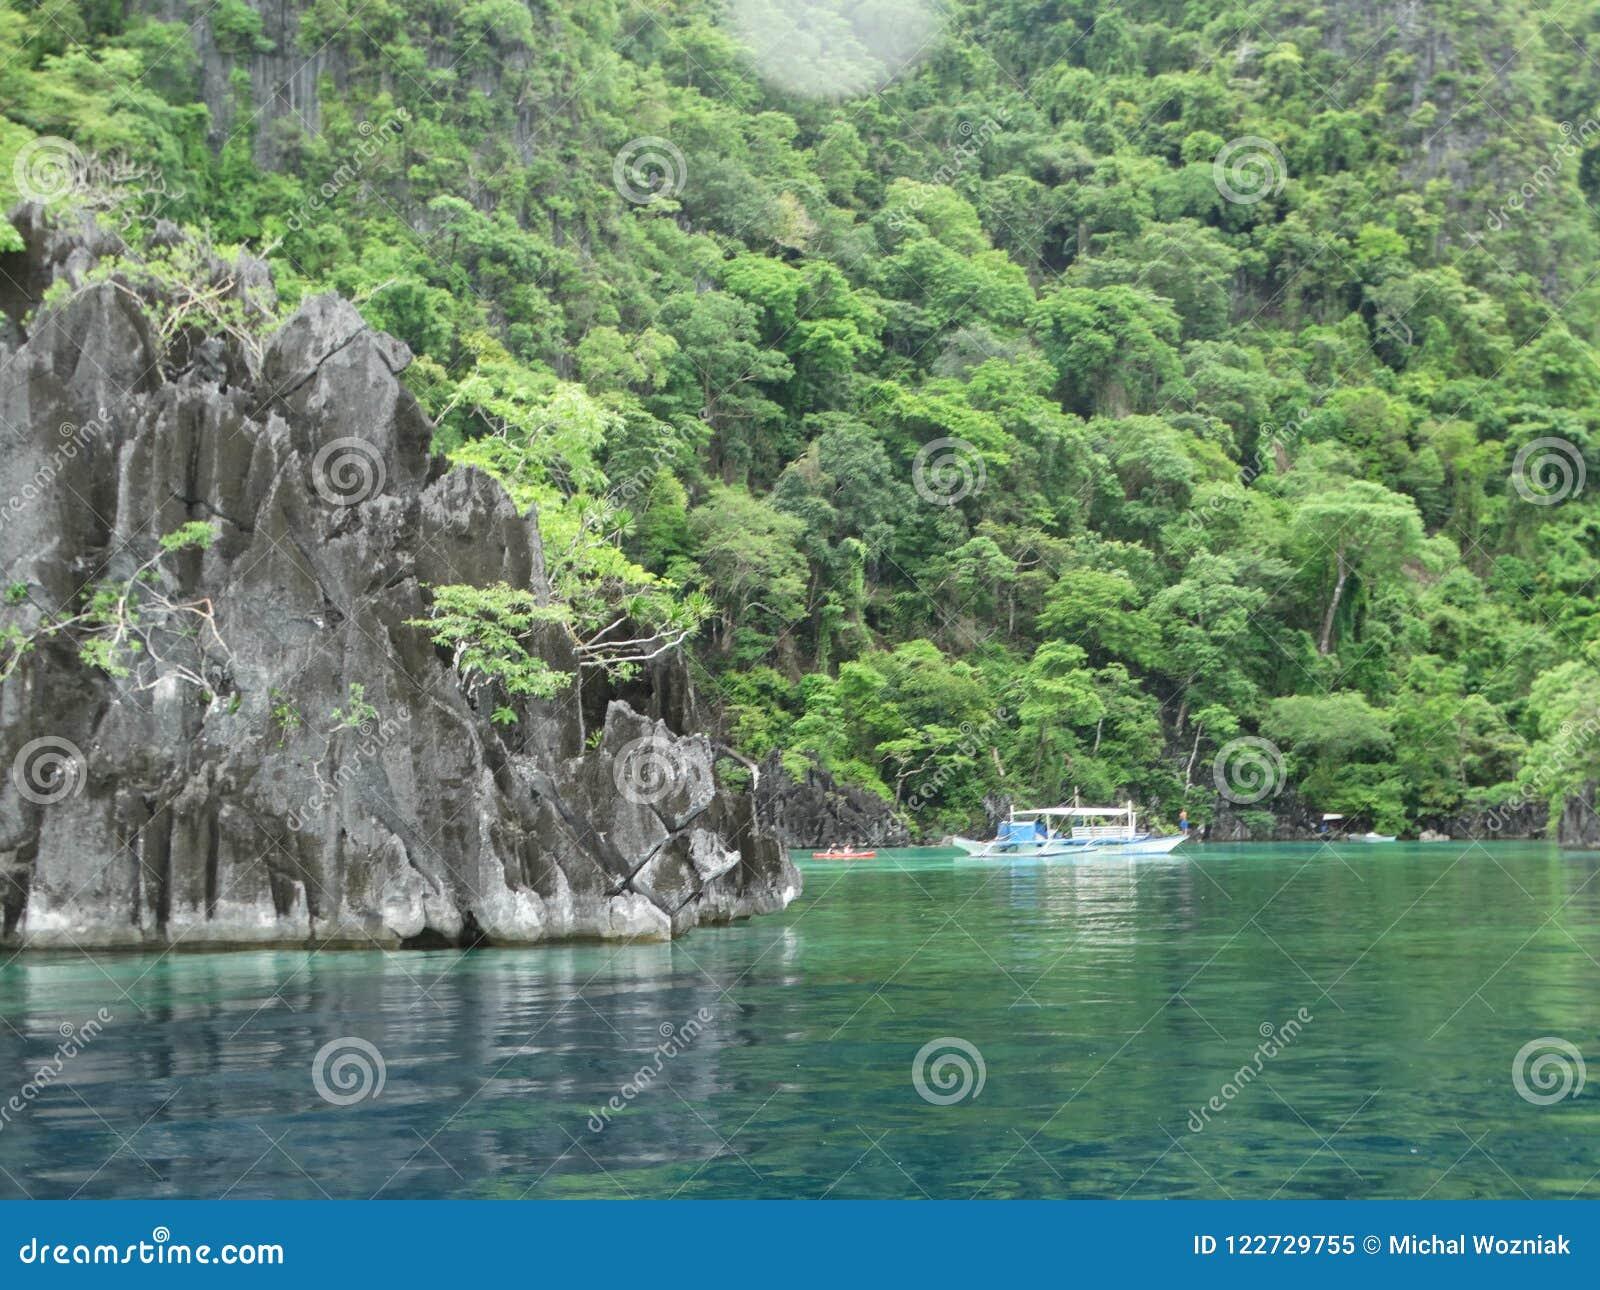 Coron Palawan Philippines Island Hopping Stock Image